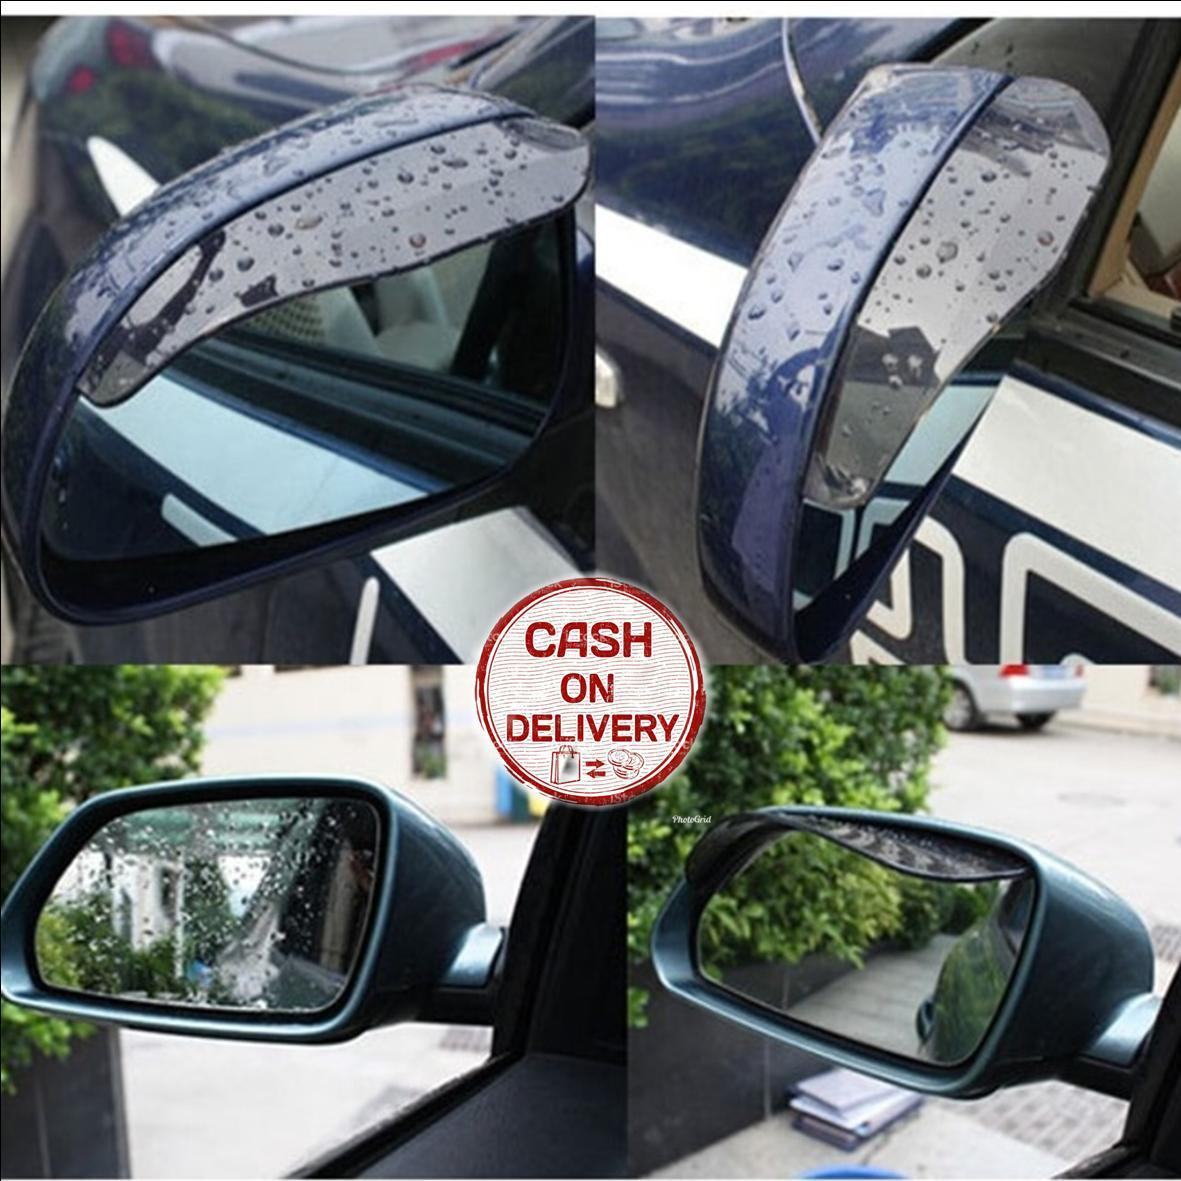 Kado Unik-- Mika Penutup Kaca Spion Mobil 1 Set Isi 2 / Car Cover Mirror / Talang Spion Mobil Anti Air Hujan / Pelindung Spion Dari Hujan / Mika Pelindung Spion / Penutup Kaca Mobil Murah